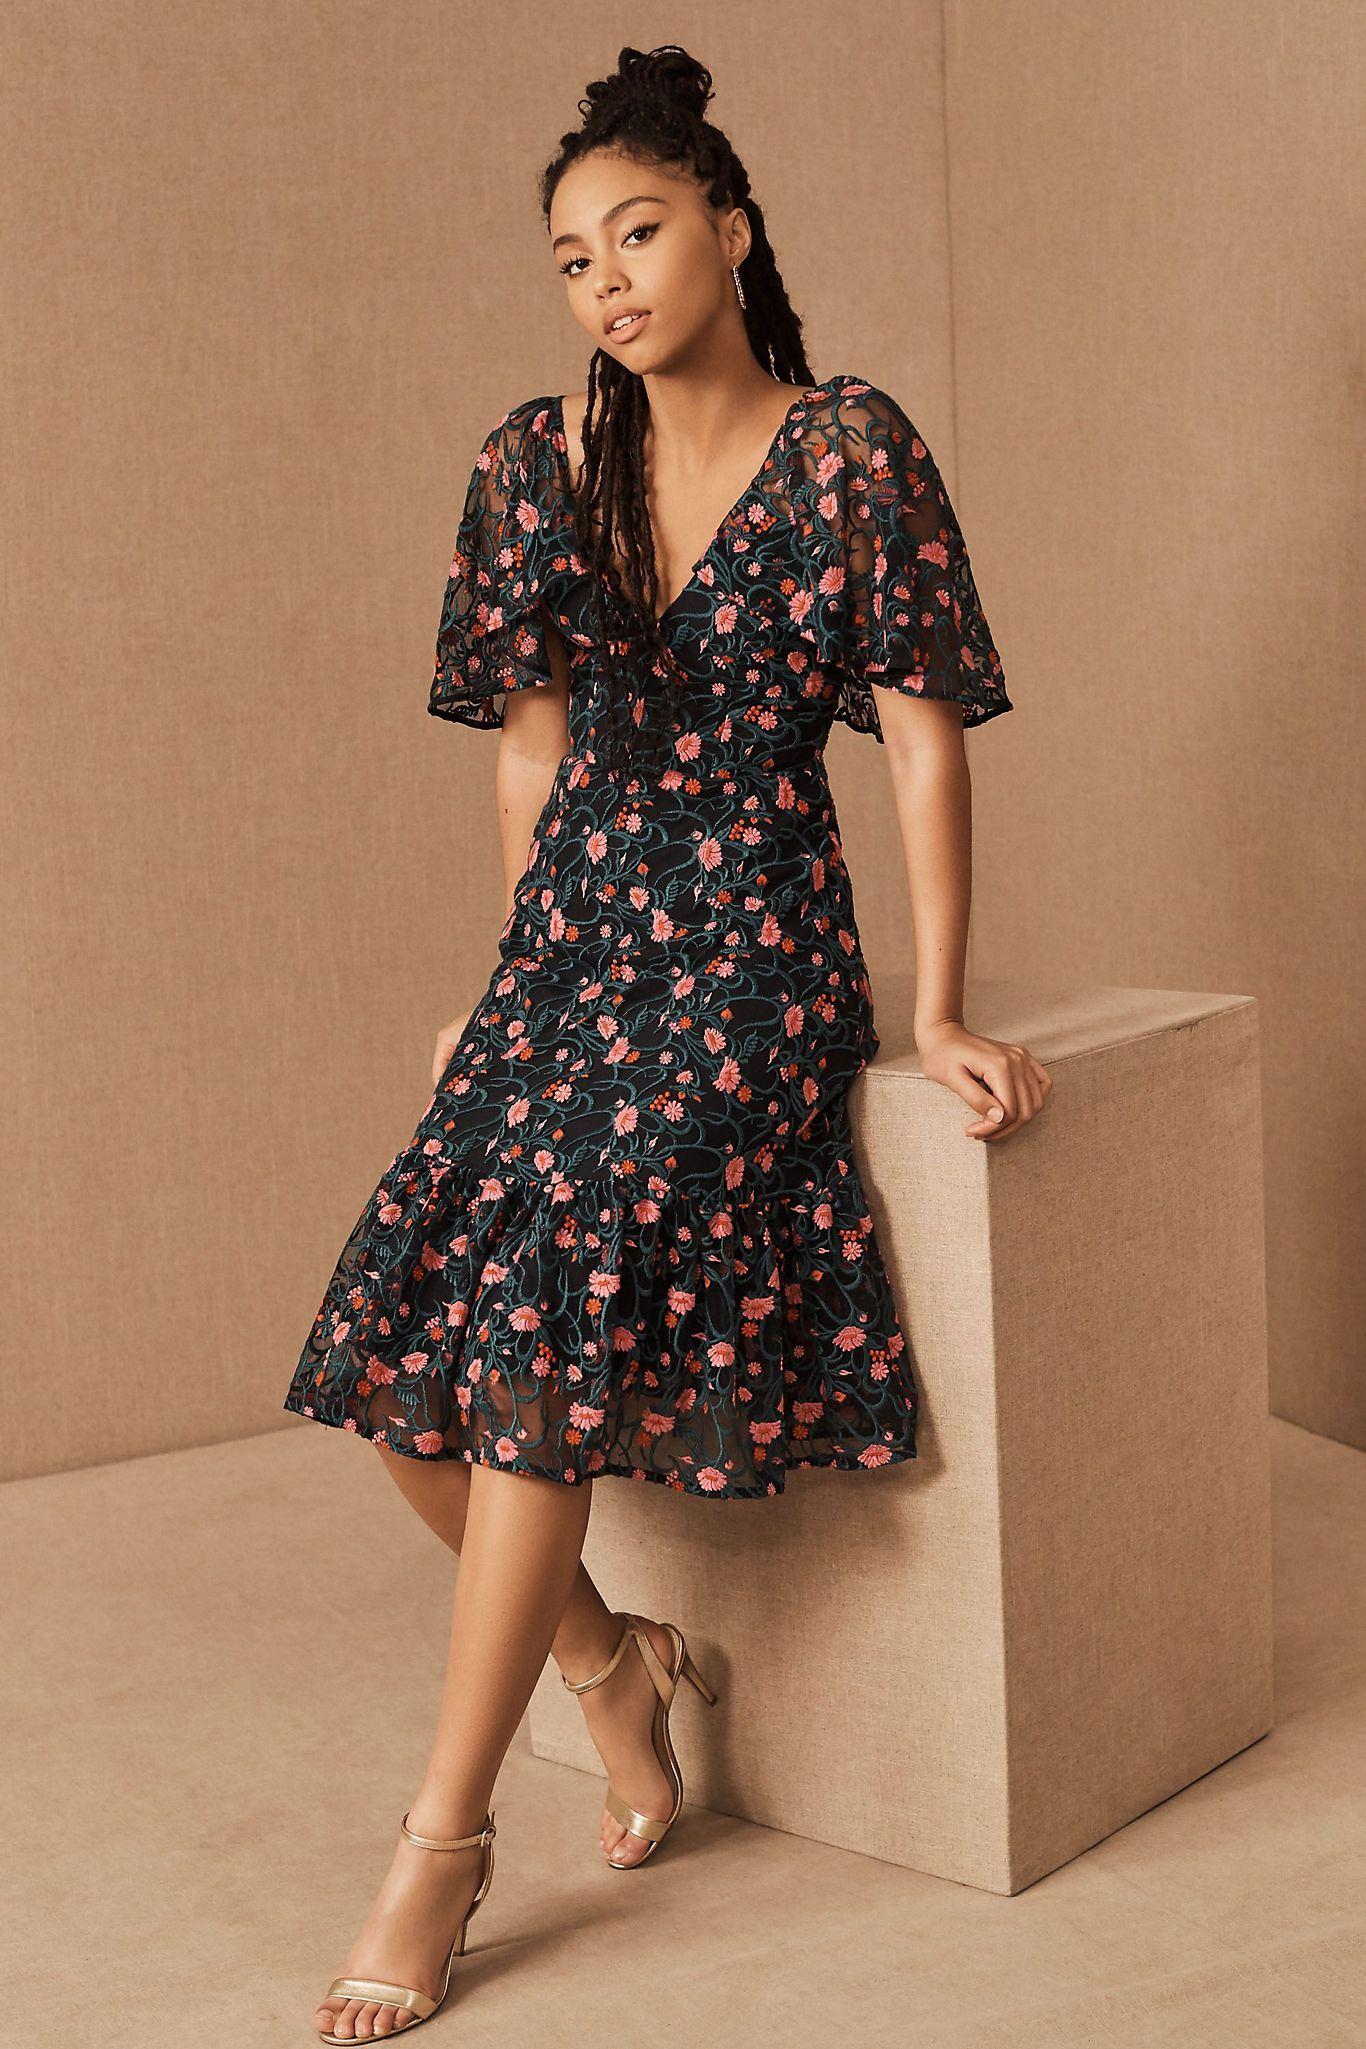 Shoshanna Chloe Petite Midi Dress in